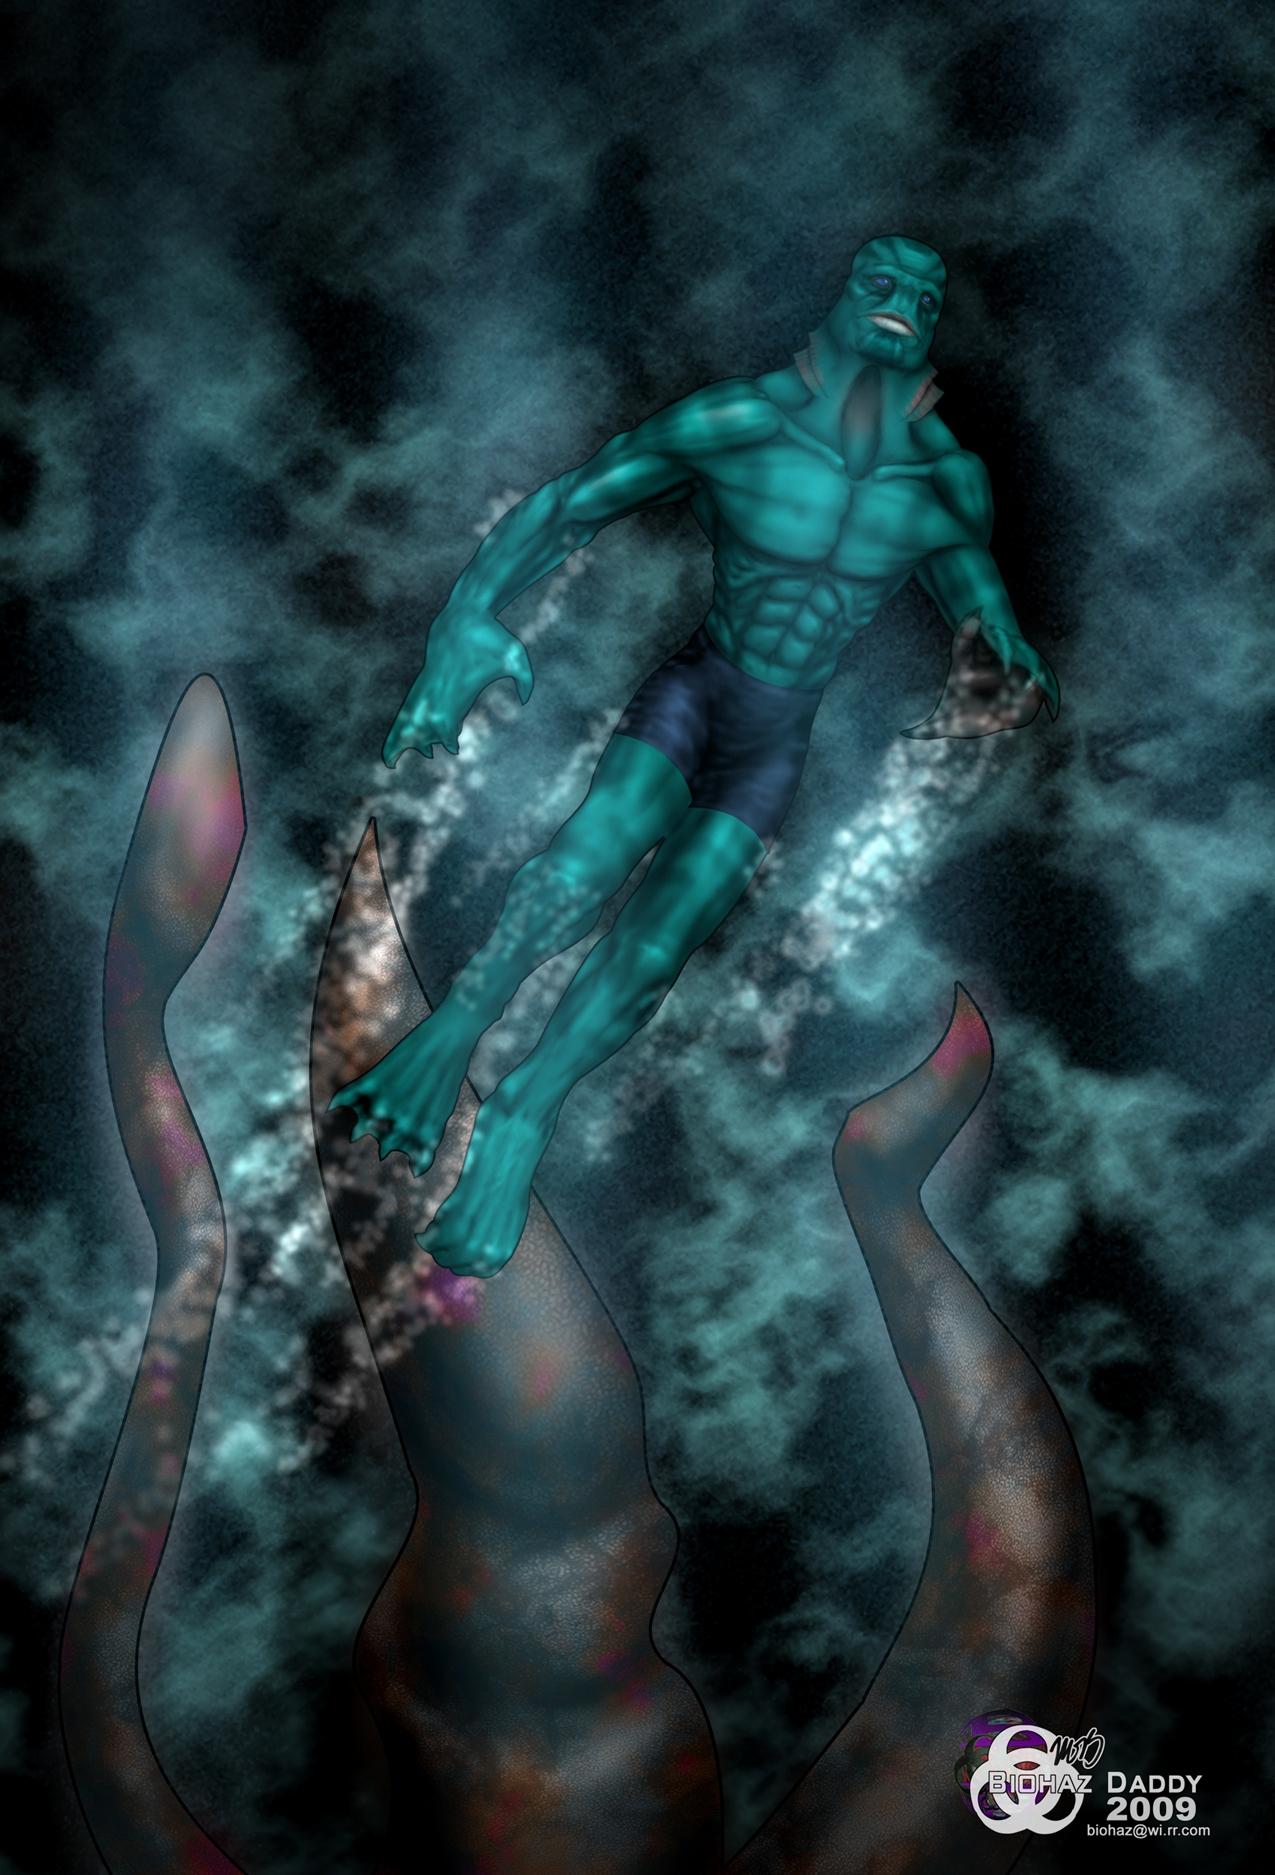 Abe Sapian for tartanninja from Biohaz_Daddy